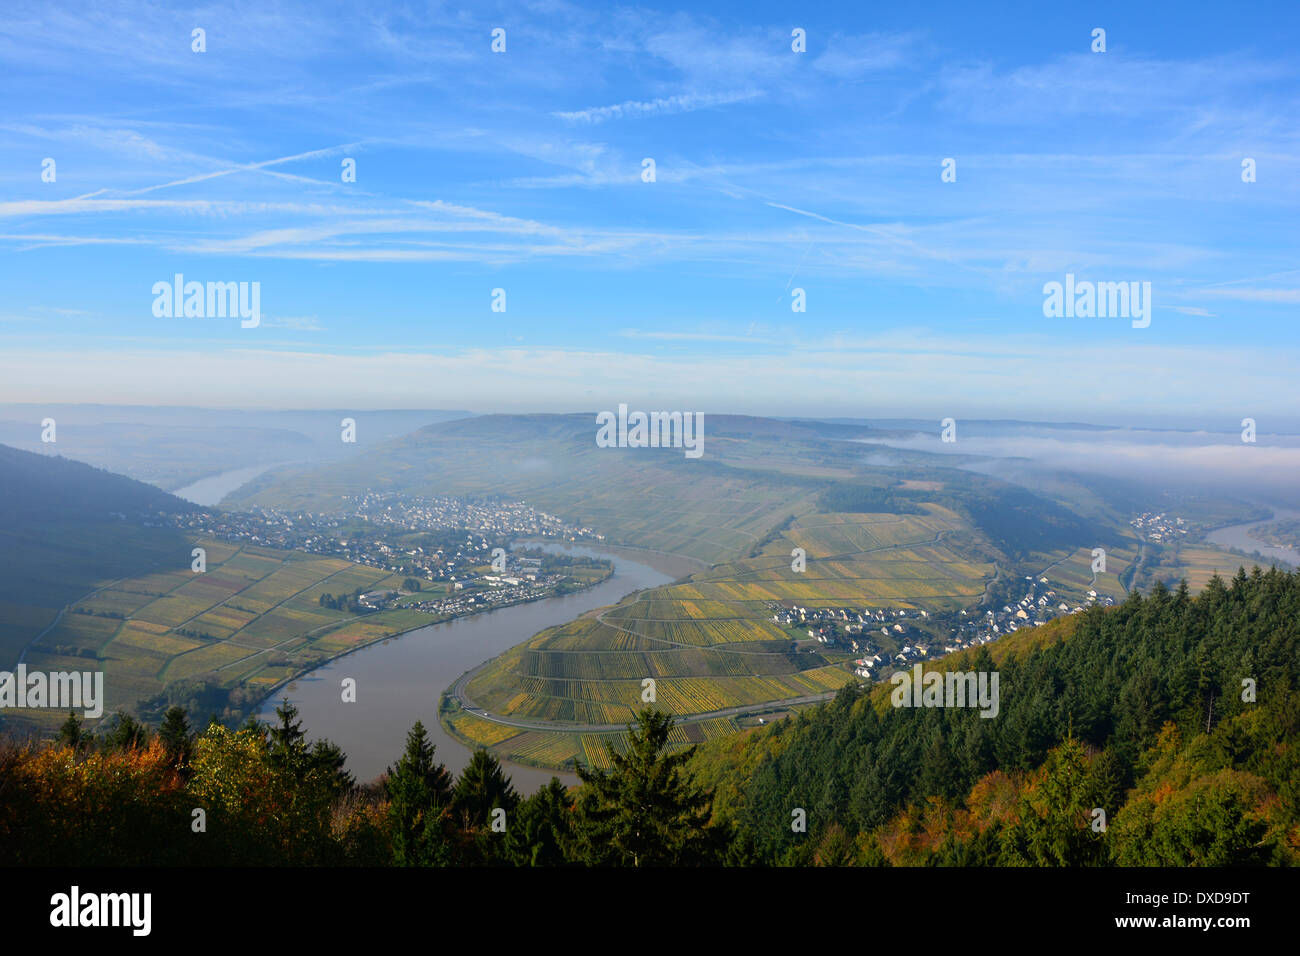 Moselle river valley vineyard landscape with blue sky Germany Blick auf die Mosel Mosellscheife Fünf-Seen-Blick Detzem Stock Photo